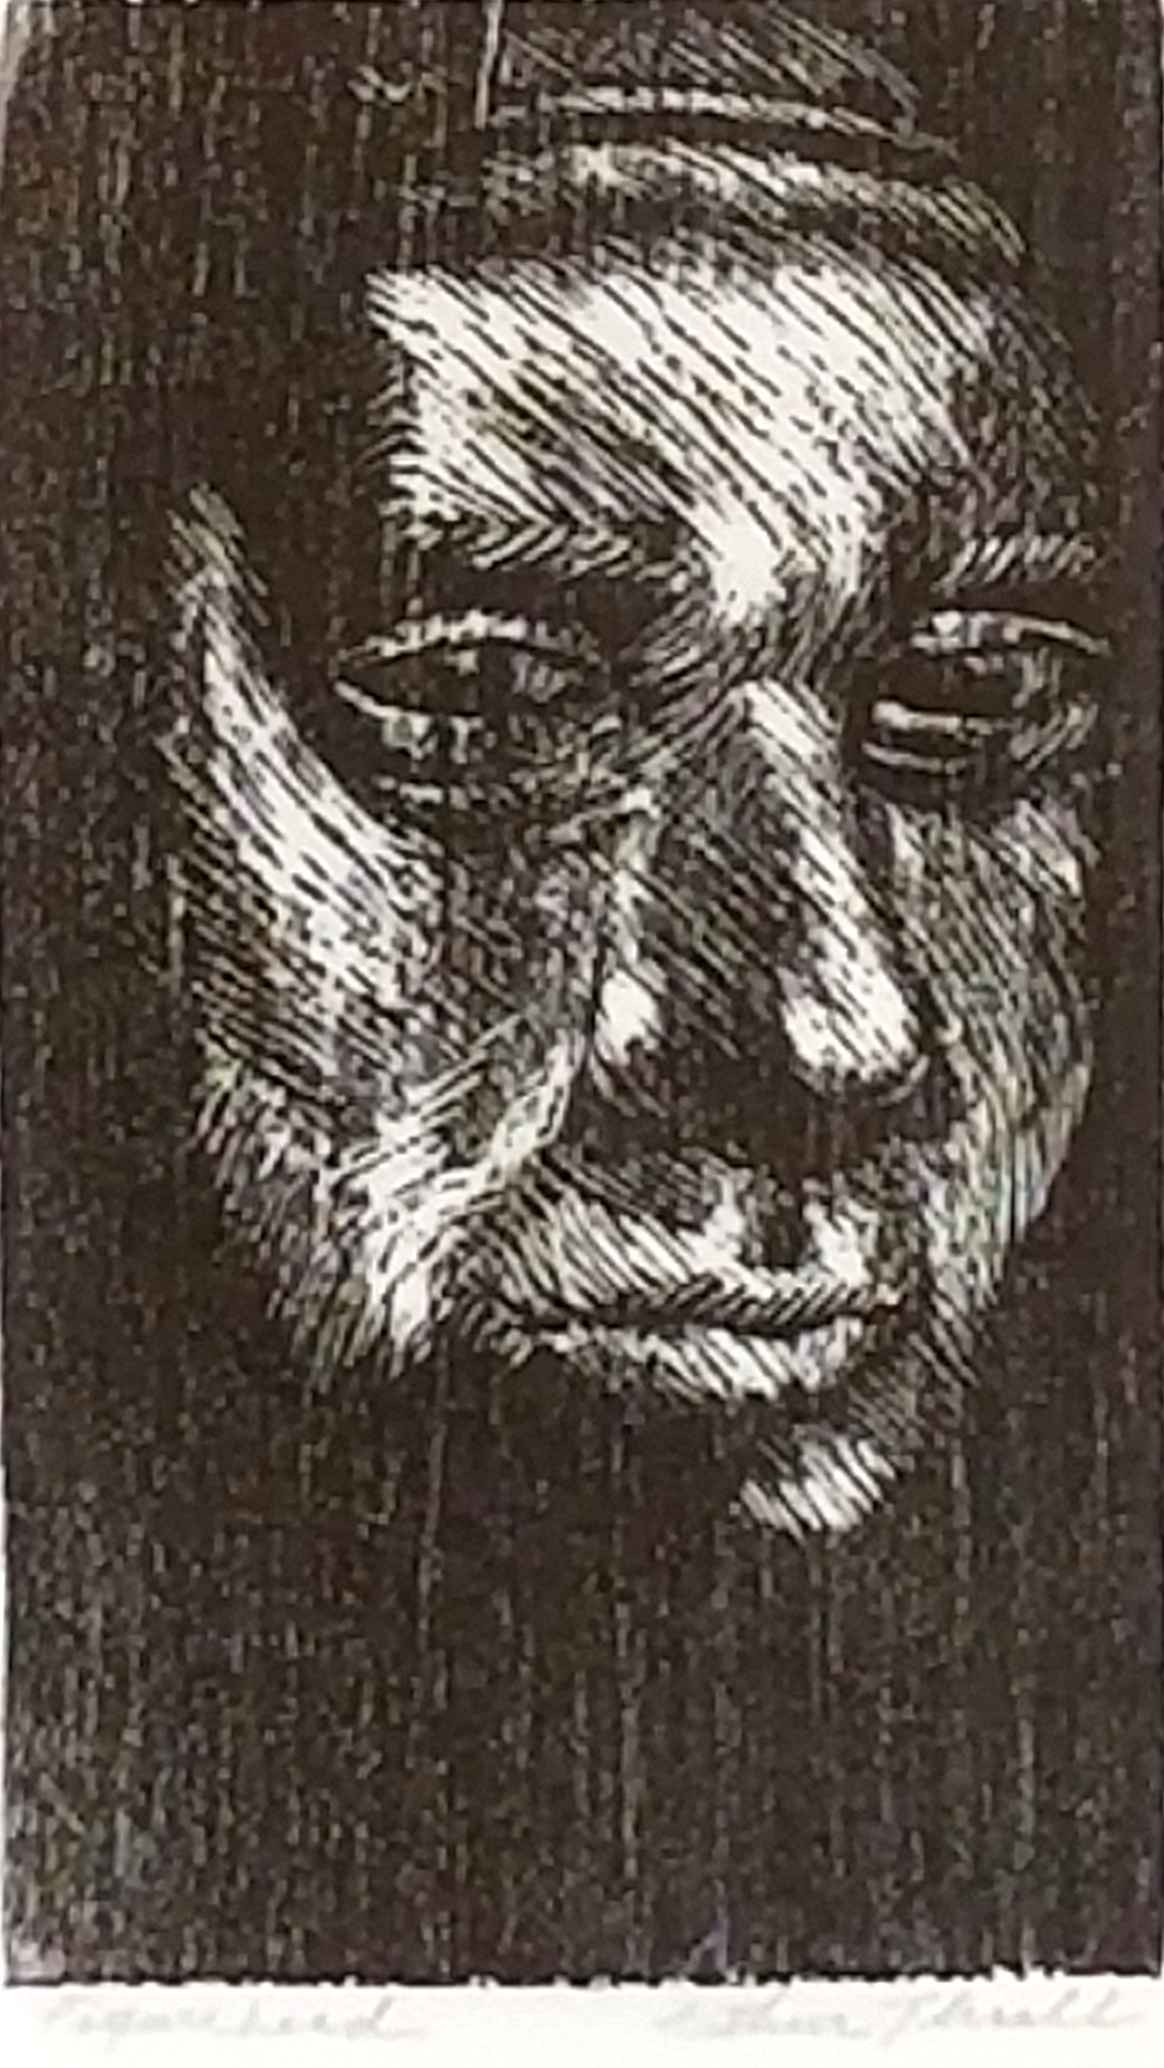 Figurehead by Mr. Arthur Thrall - Masterpiece Online